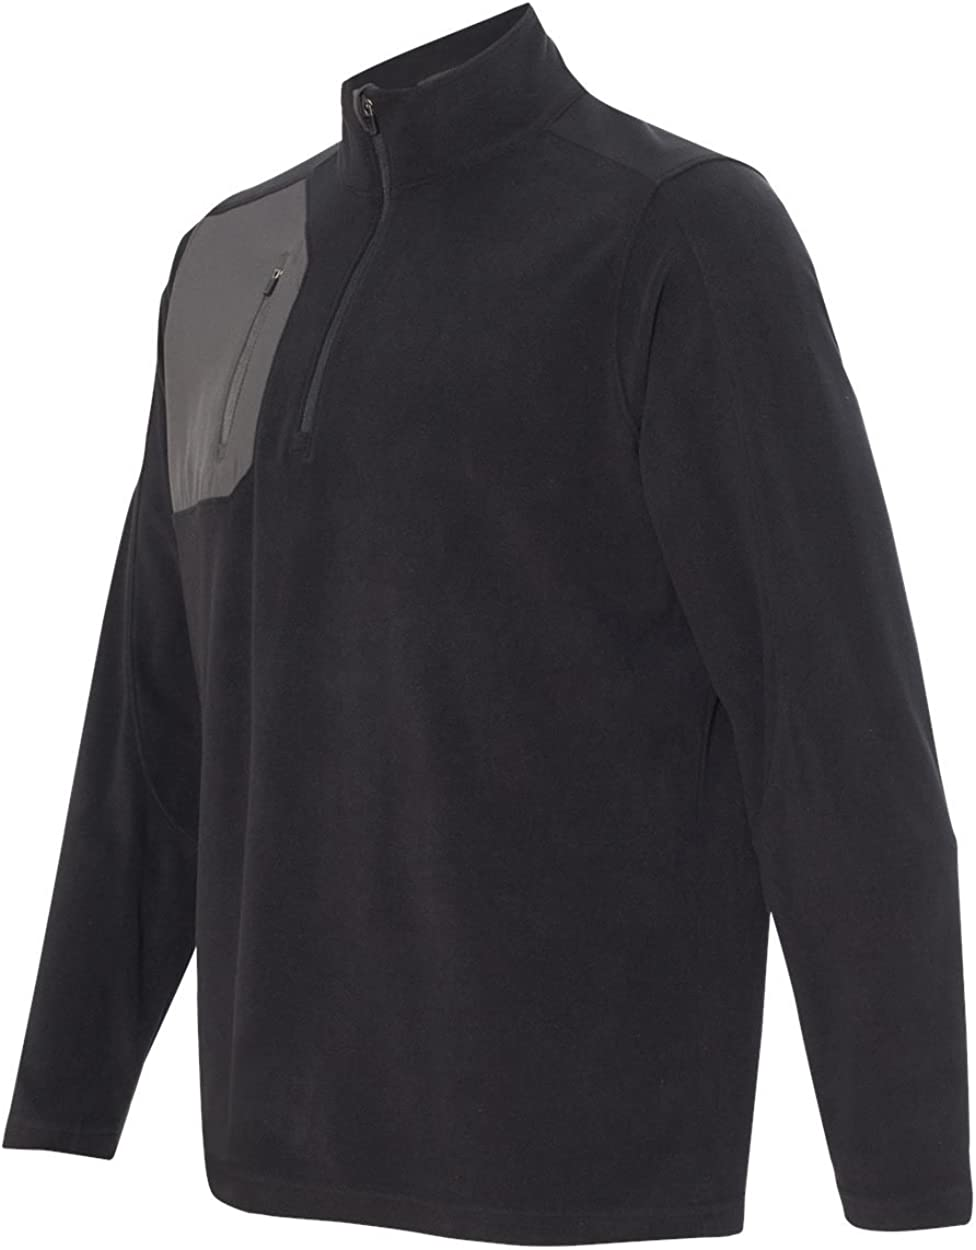 DRI Duck Men's 7345 Interval DDX Quarter-Zip Nano Fleece Nylon Pullover Jacket (4X-Large, Black/Charcoal)